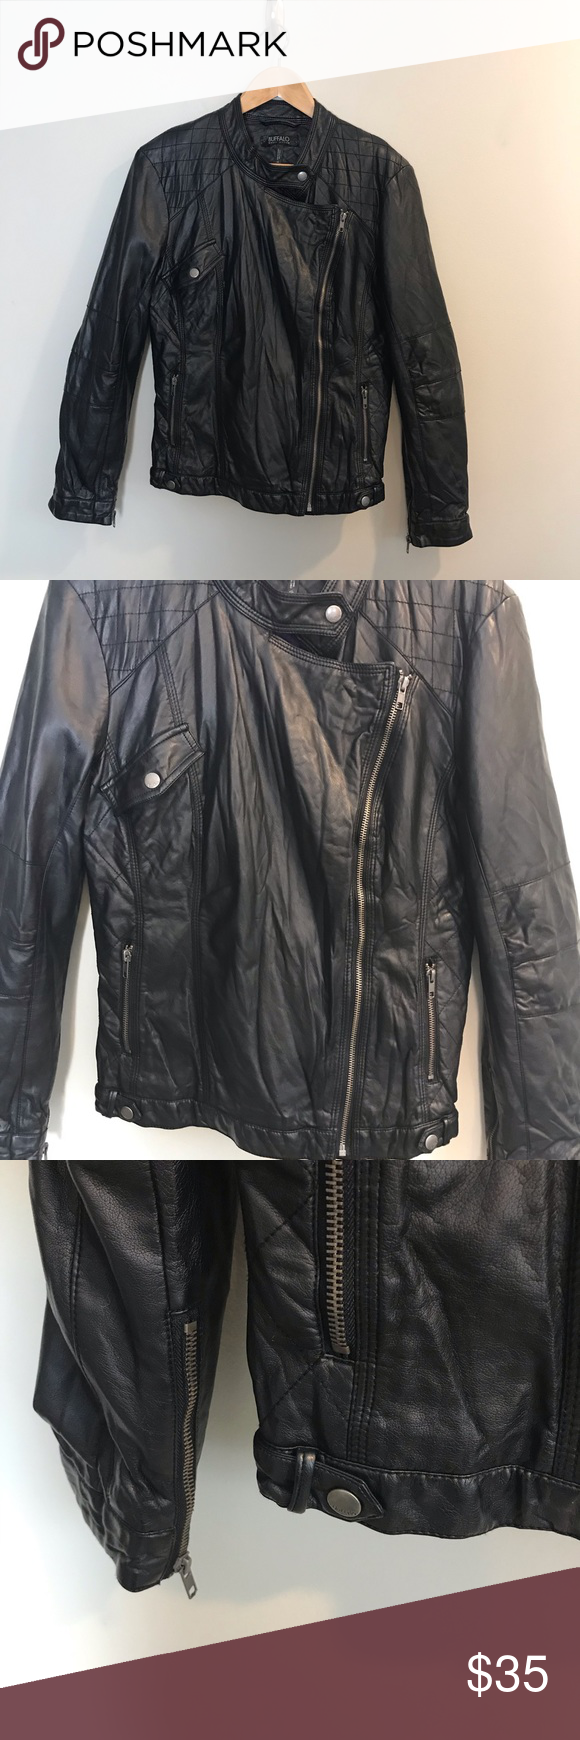 Buffalo David Bitton Black Motorcycle Jacket L Black Motorcycle Jacket Jackets Black Motorcycle